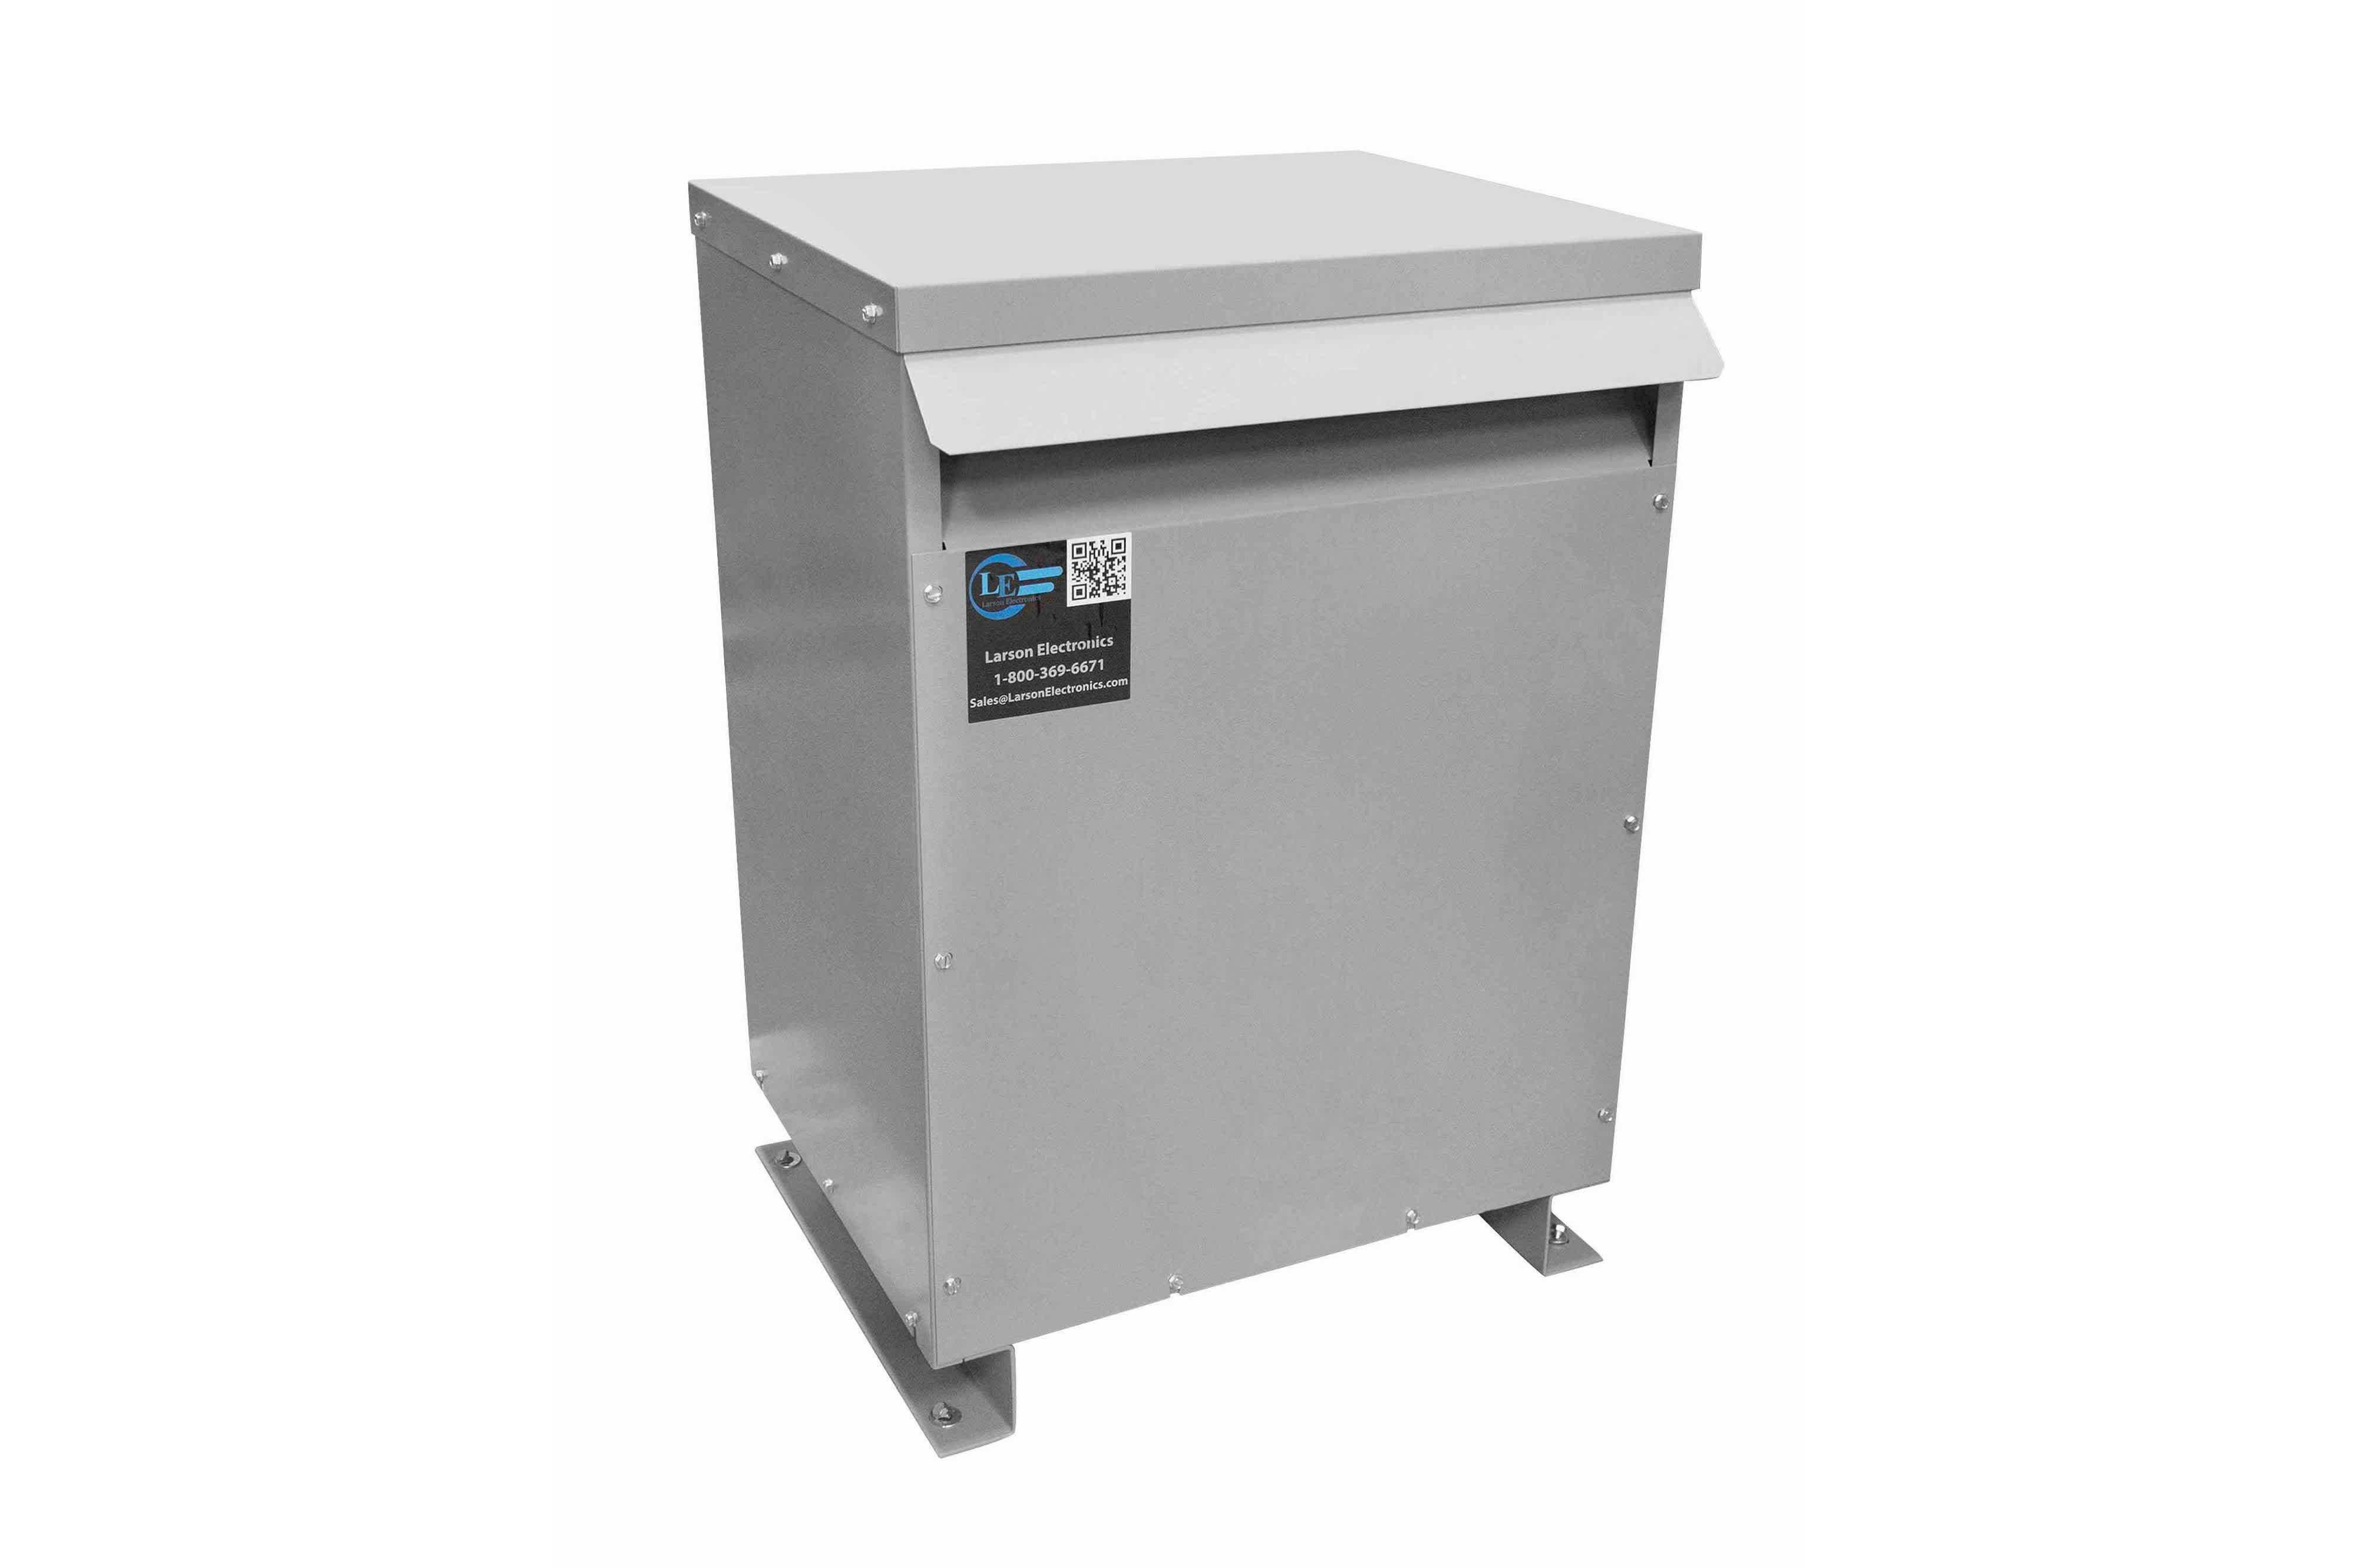 112.5 kVA 3PH Isolation Transformer, 240V Wye Primary, 208Y/120 Wye-N Secondary, N3R, Ventilated, 60 Hz